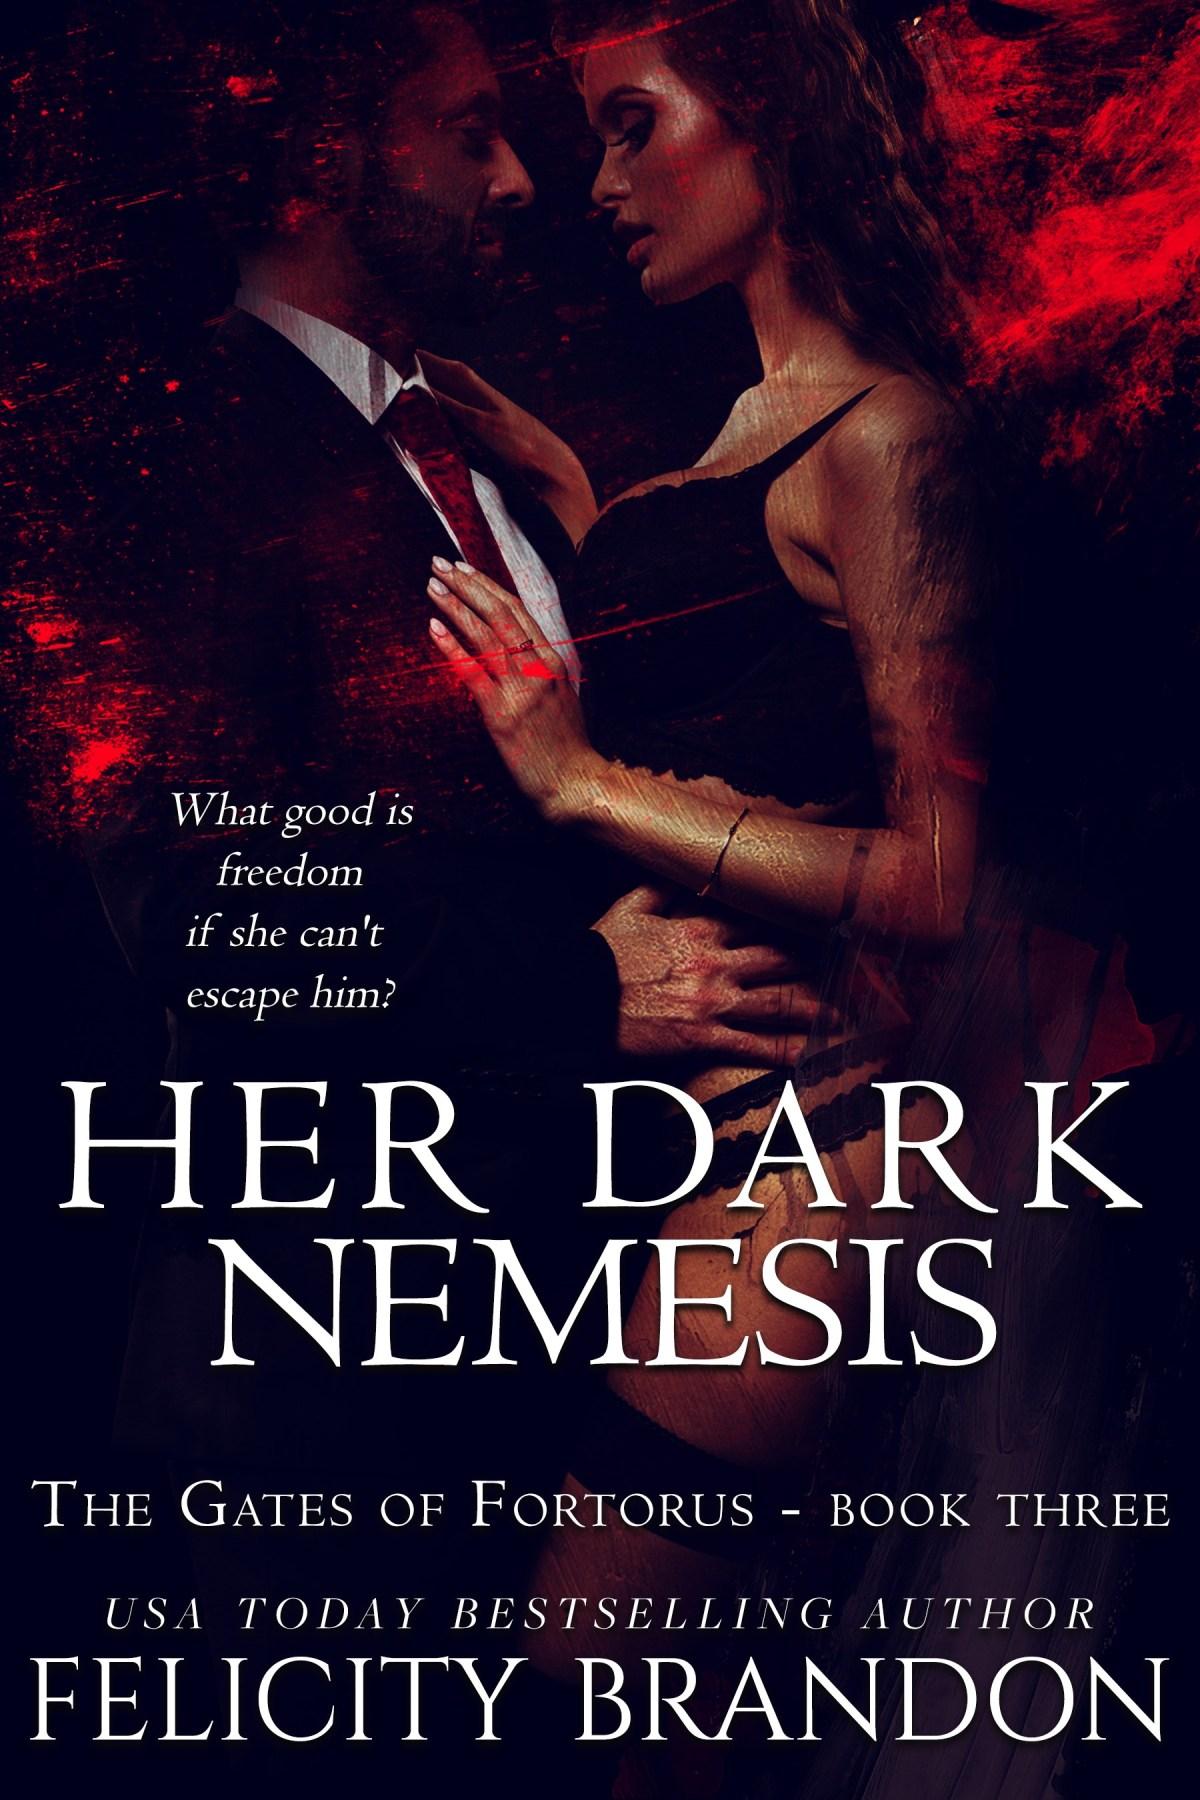 Her Dark Nemesis Cover Reveal!